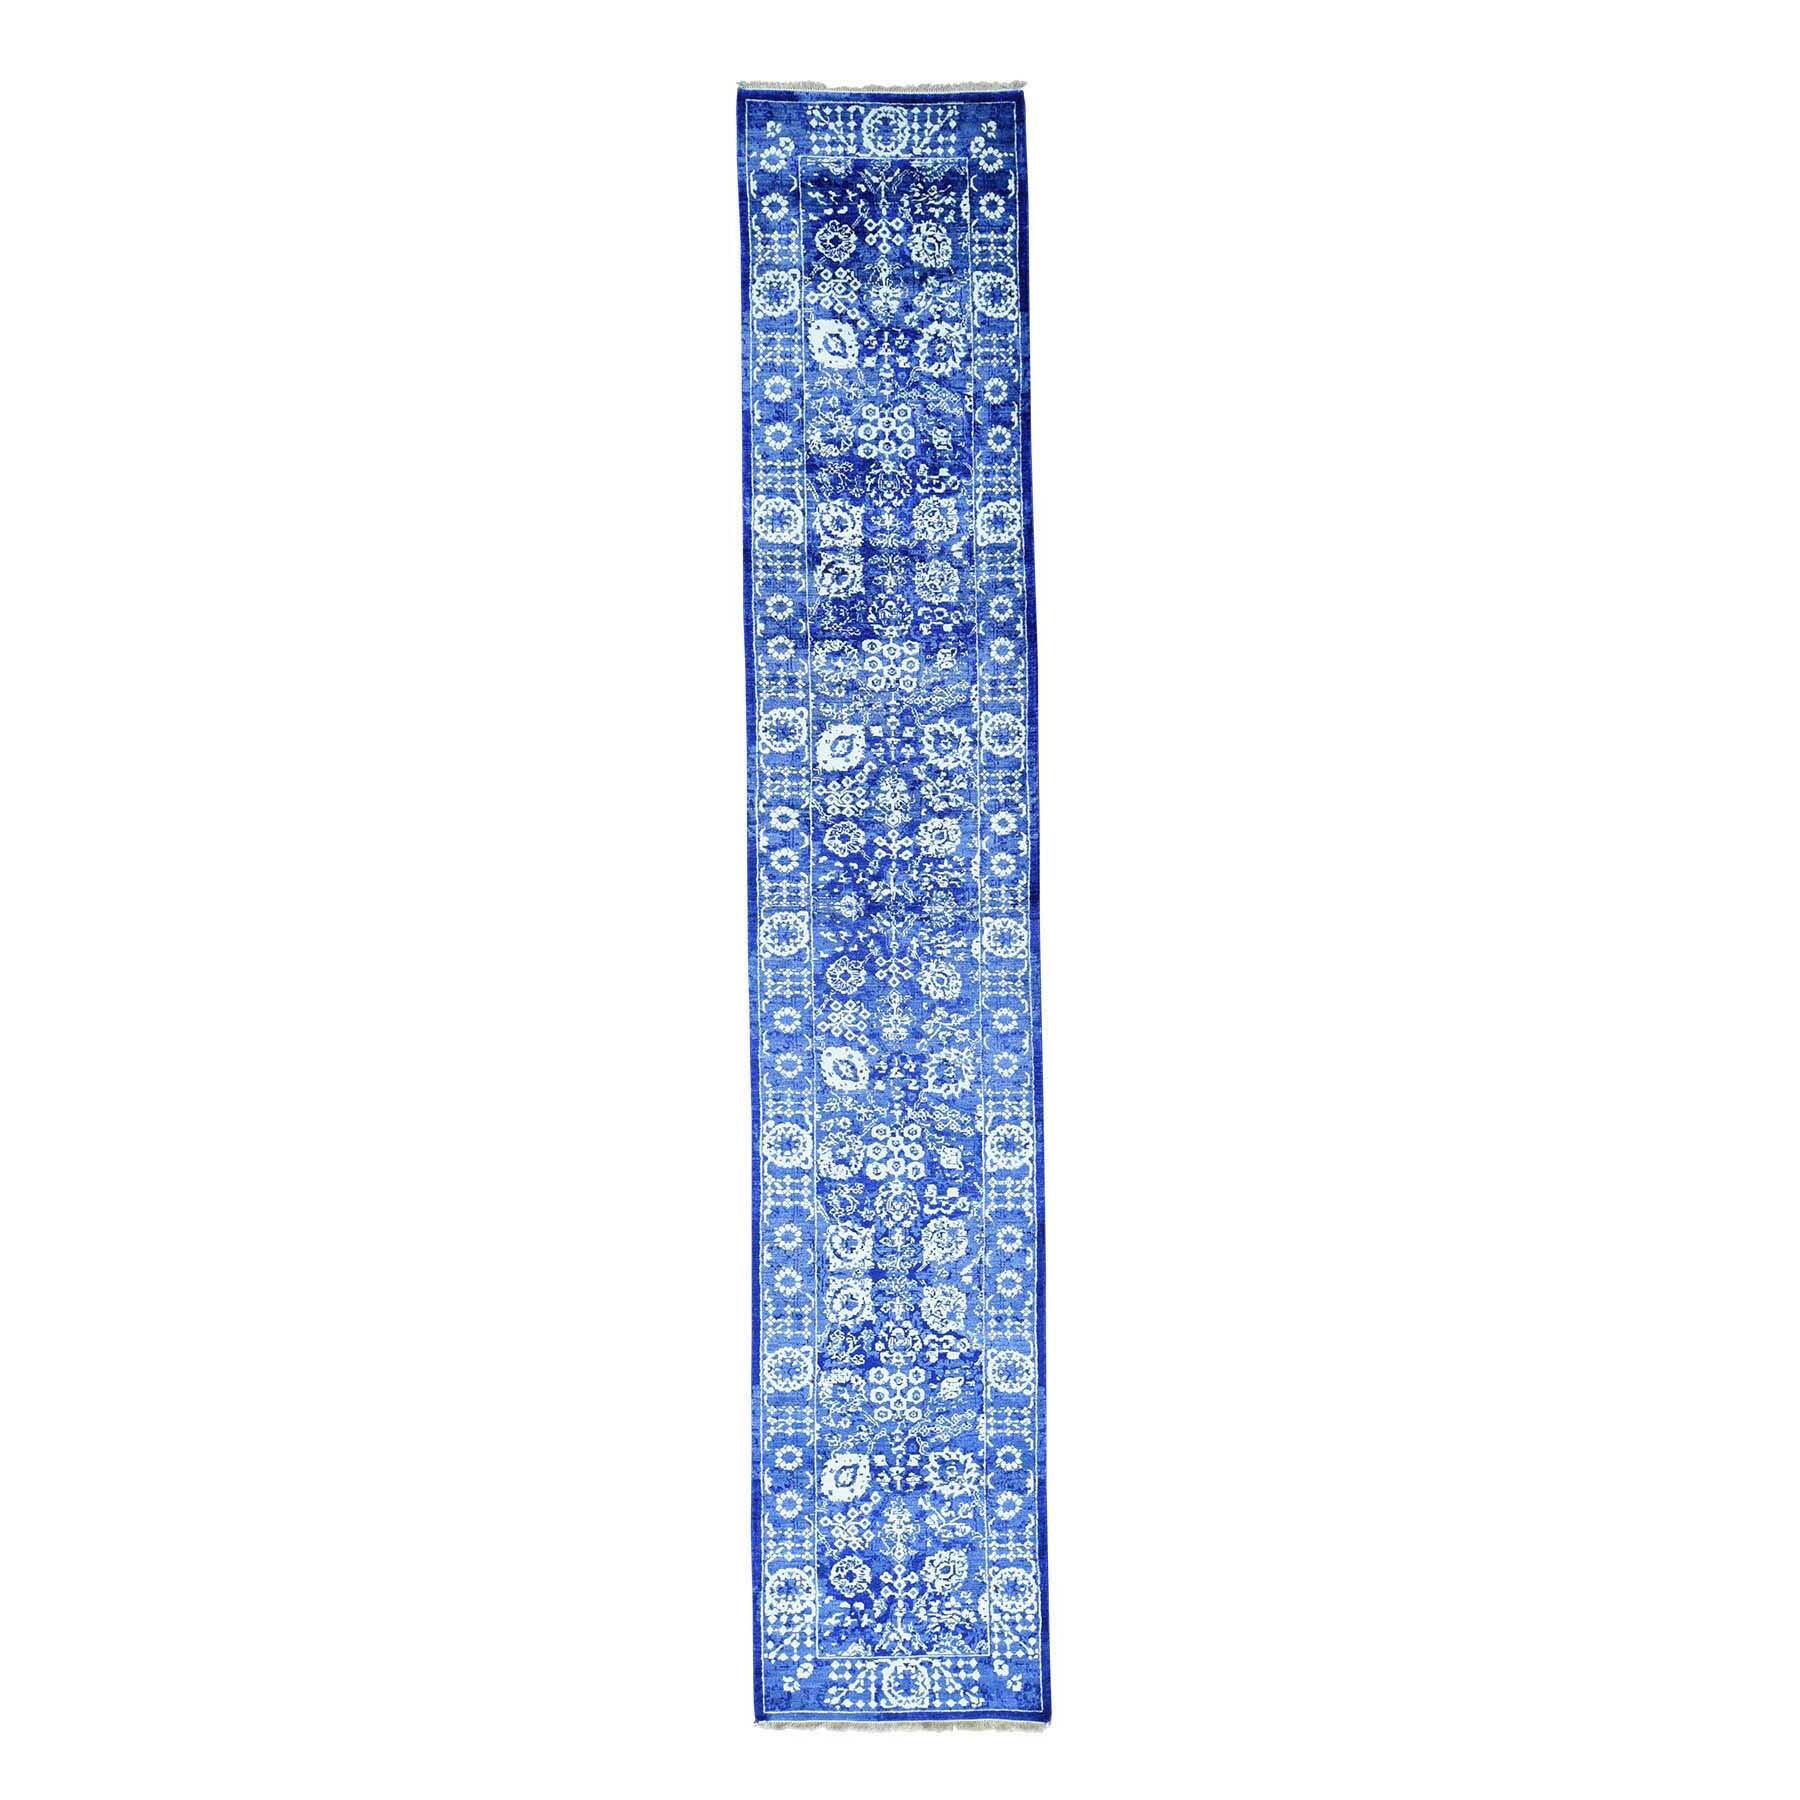 Shahbanu Rugs XL Runner Wool and Viscose from Bamboo silk Tone on Tone Tabriz Handmade Rug